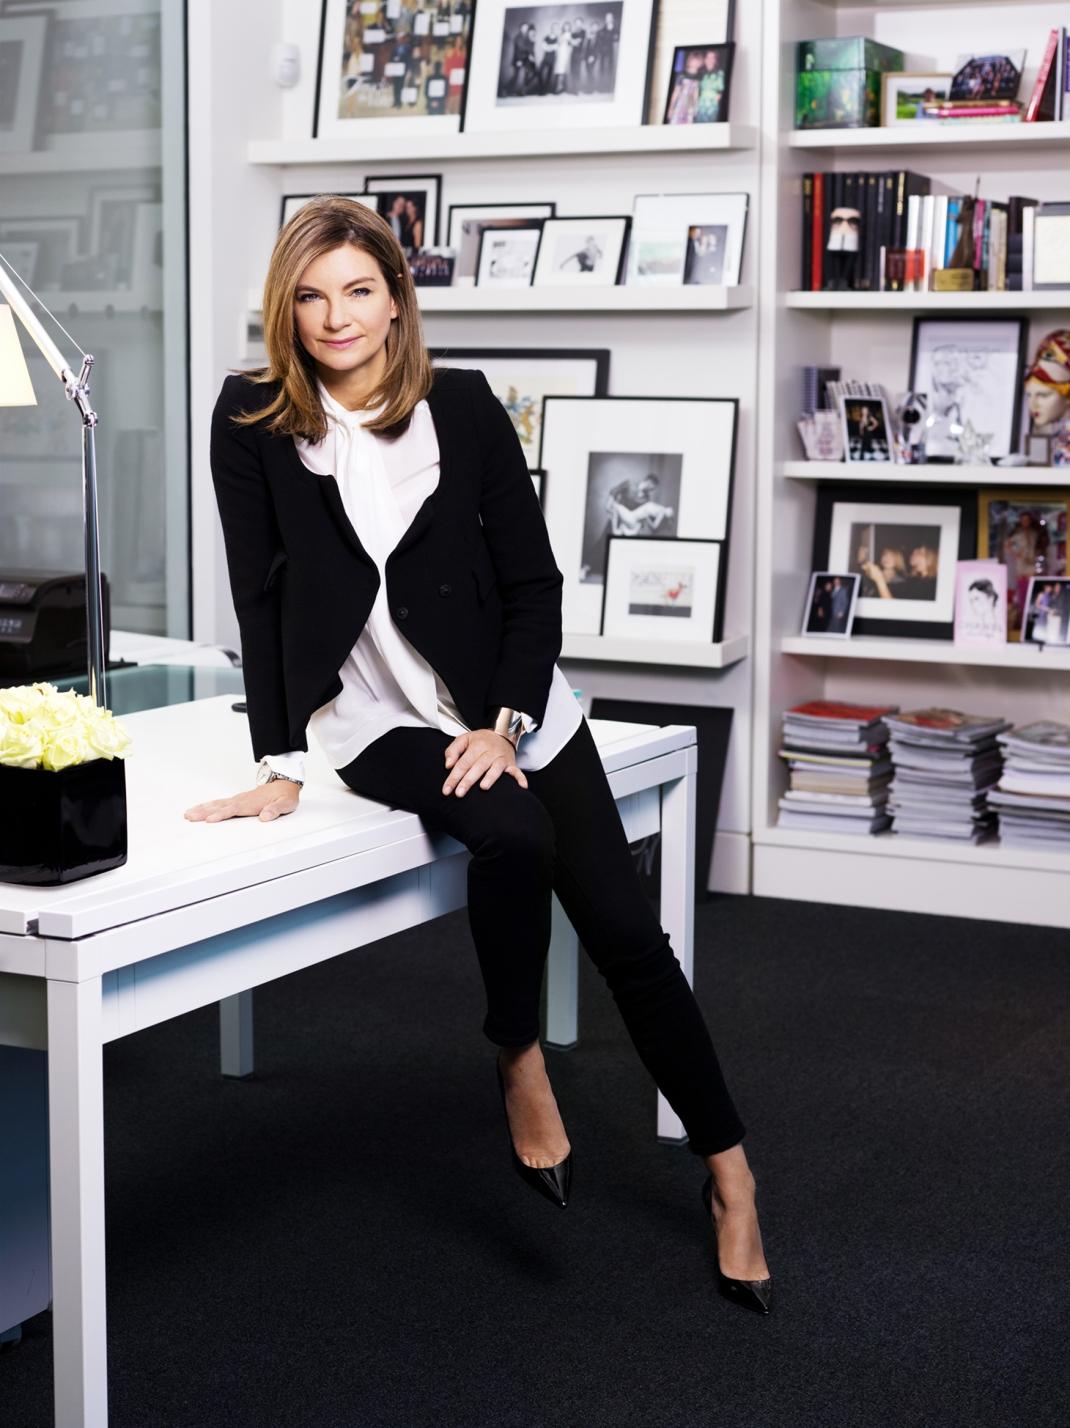 Natalie-Massenet-MBE-Founder-Chairman-NET-A-PORTER